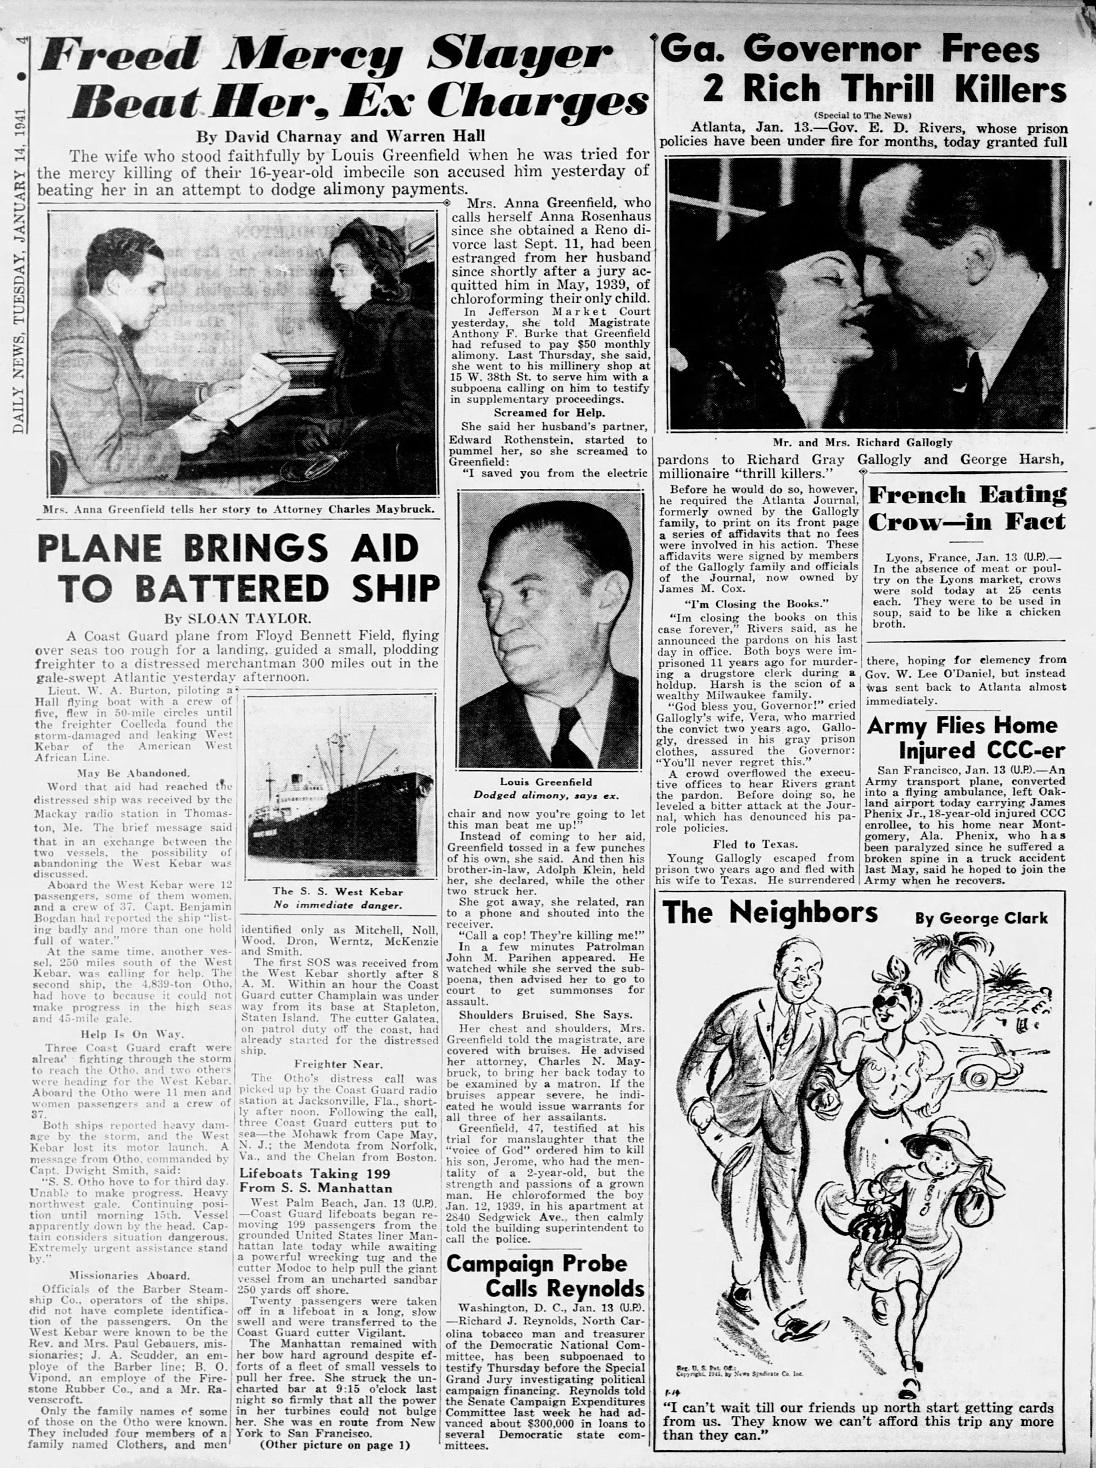 Daily_News_Tue__Jan_14__1941_.jpg